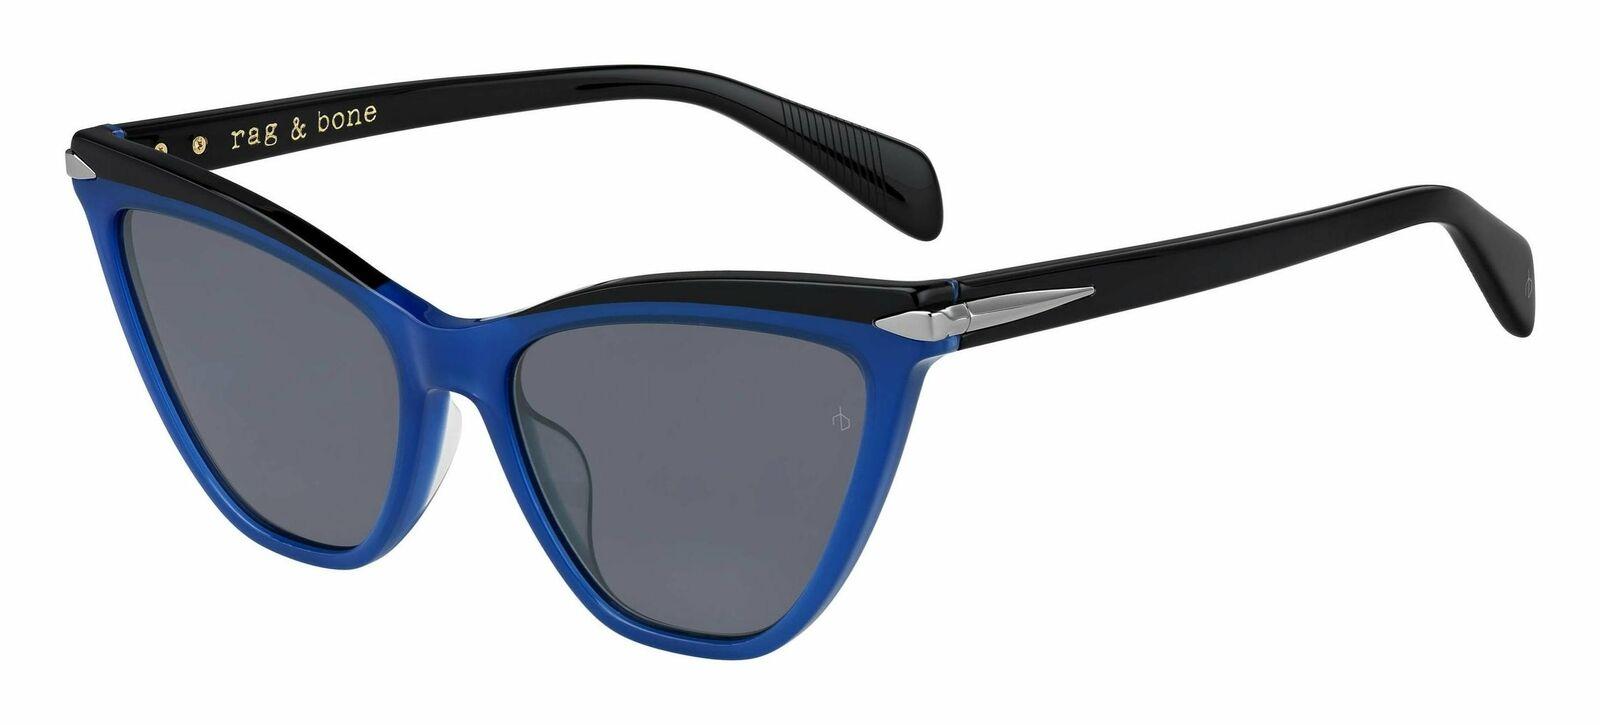 RAG & BONE-RNB 1021/S 0PJP/IR Blue Gray Blue